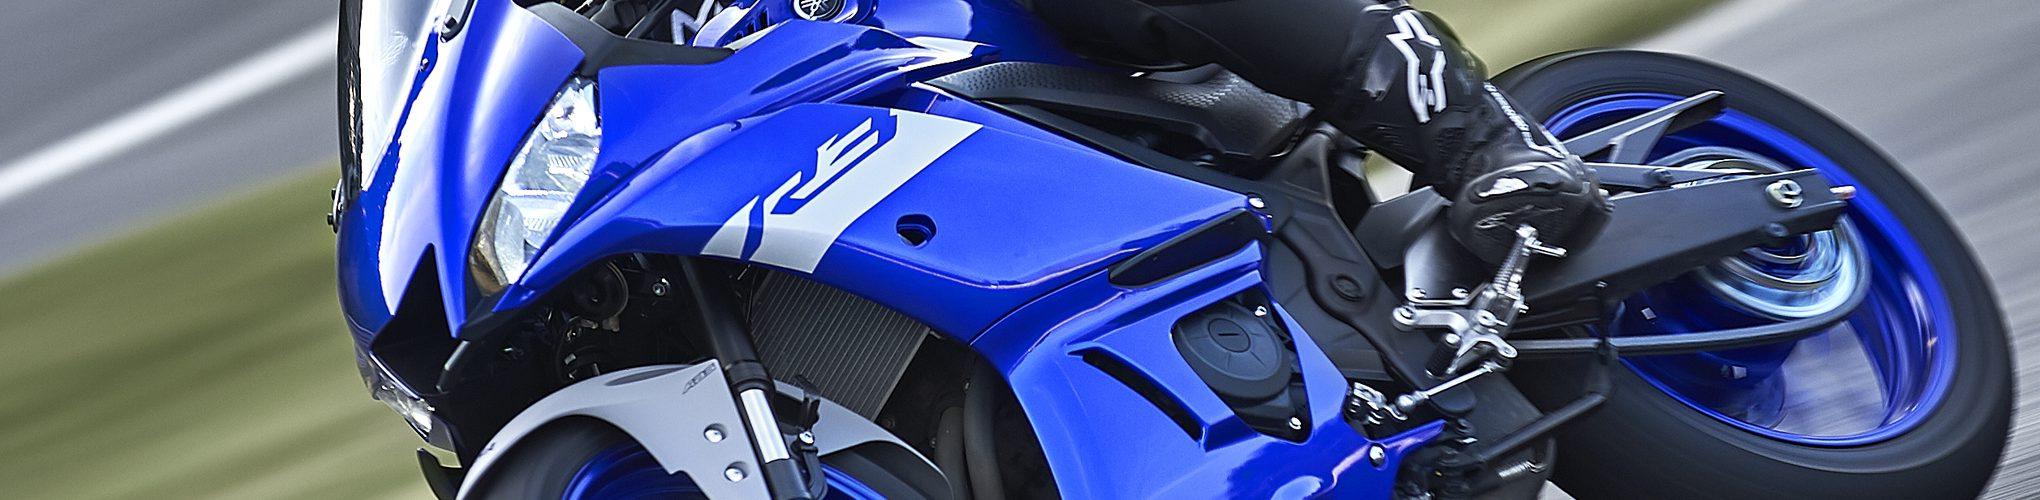 Yamaha YZF-R3 | MotorCentrumWest